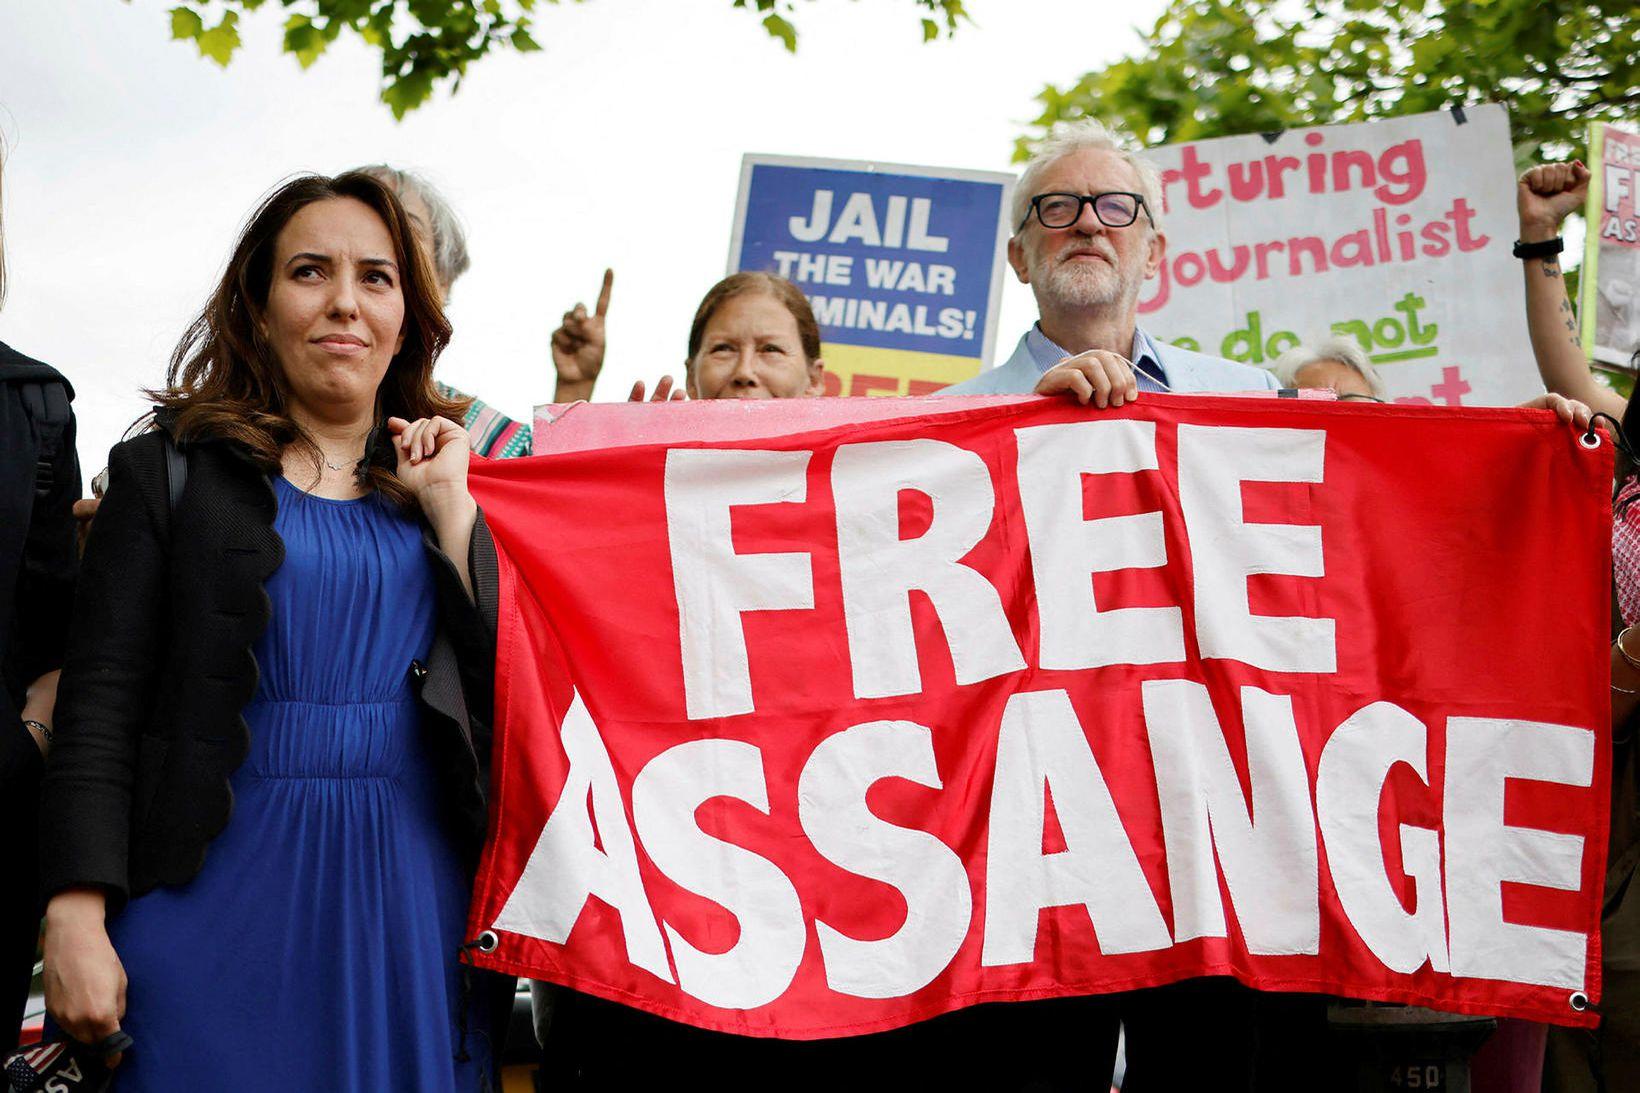 Stella Moris, lögfræðingur og unnusta Julian Assange, og Jeremy Corbyn, …